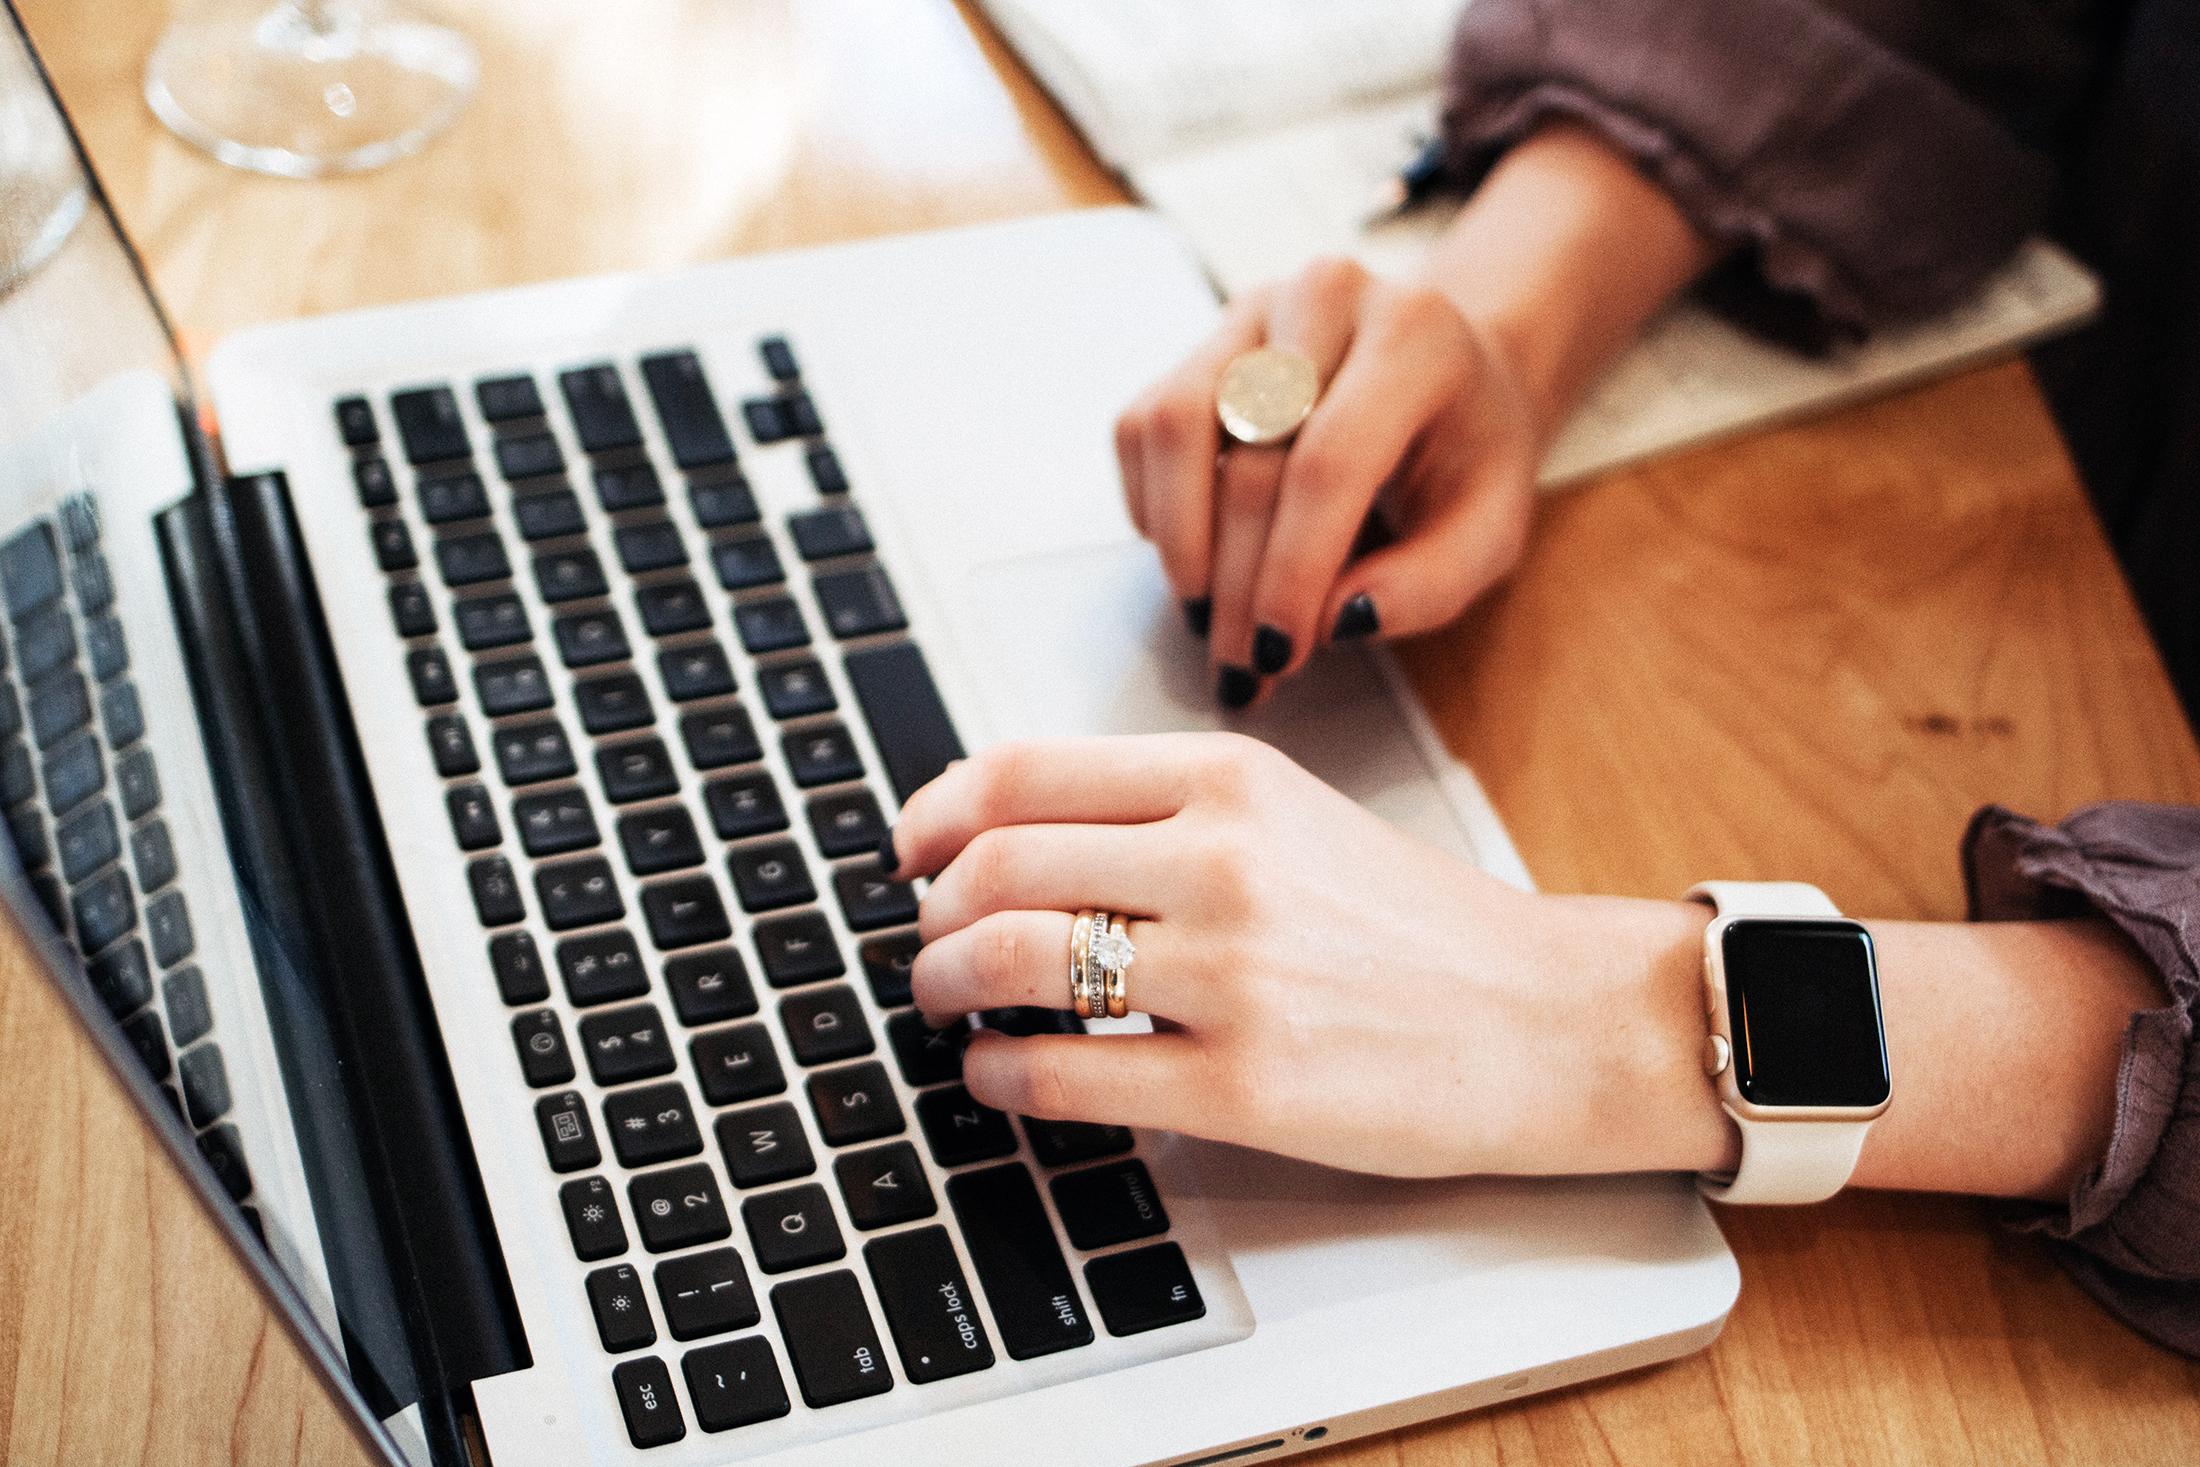 4 methods to measure your web traffic  |  Hue & Tone Creative